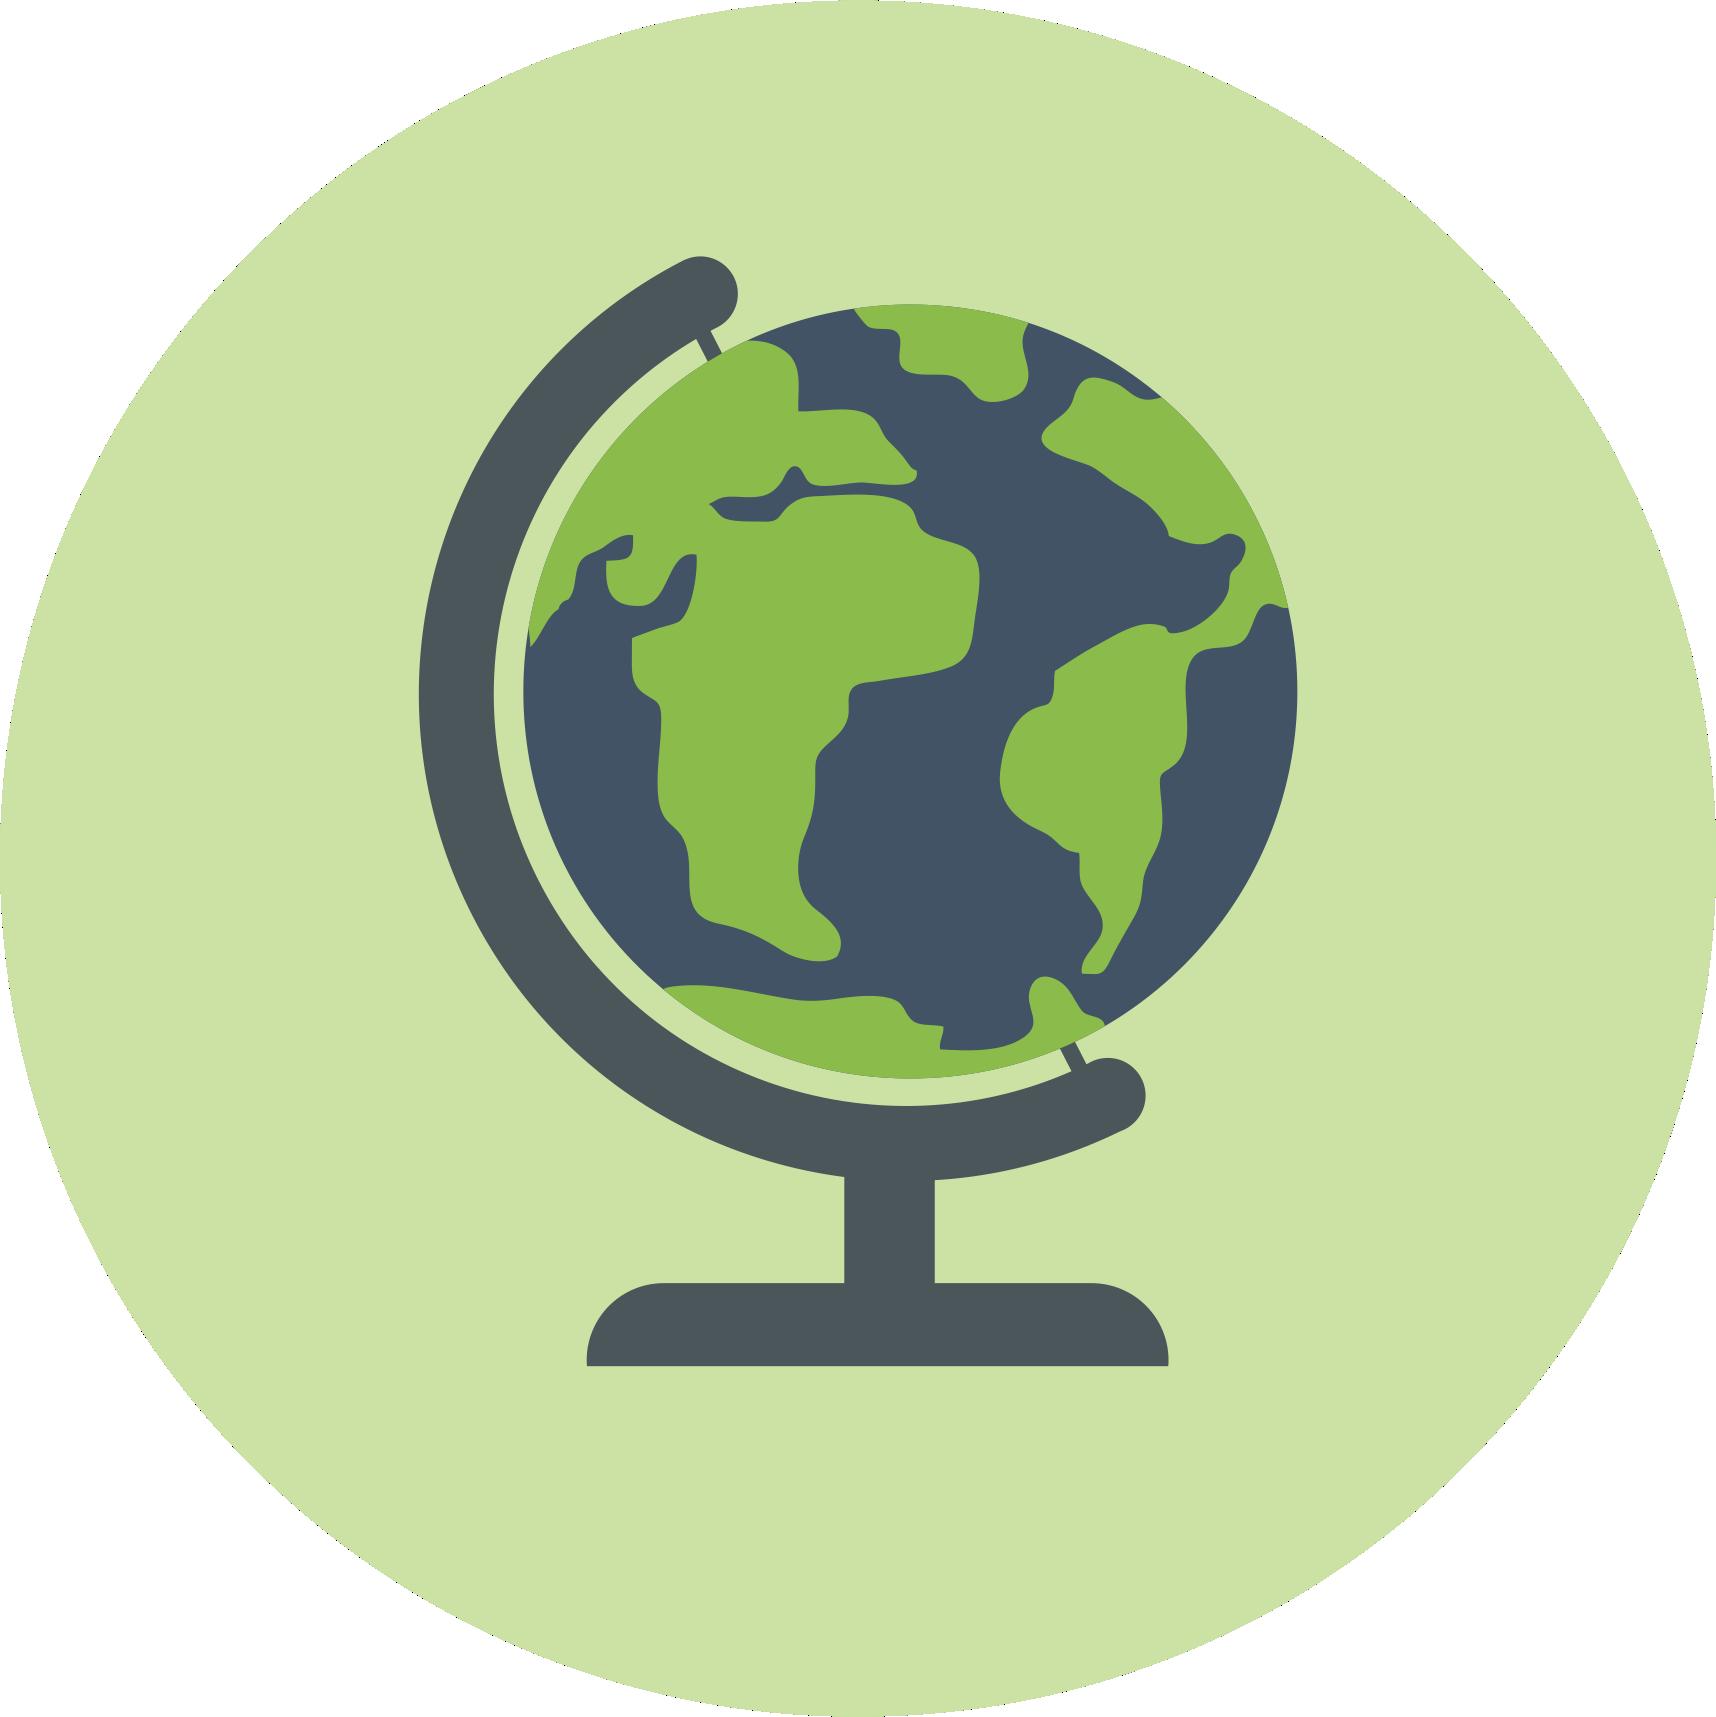 CarboPlus - Qualidade & Sustentabilidade